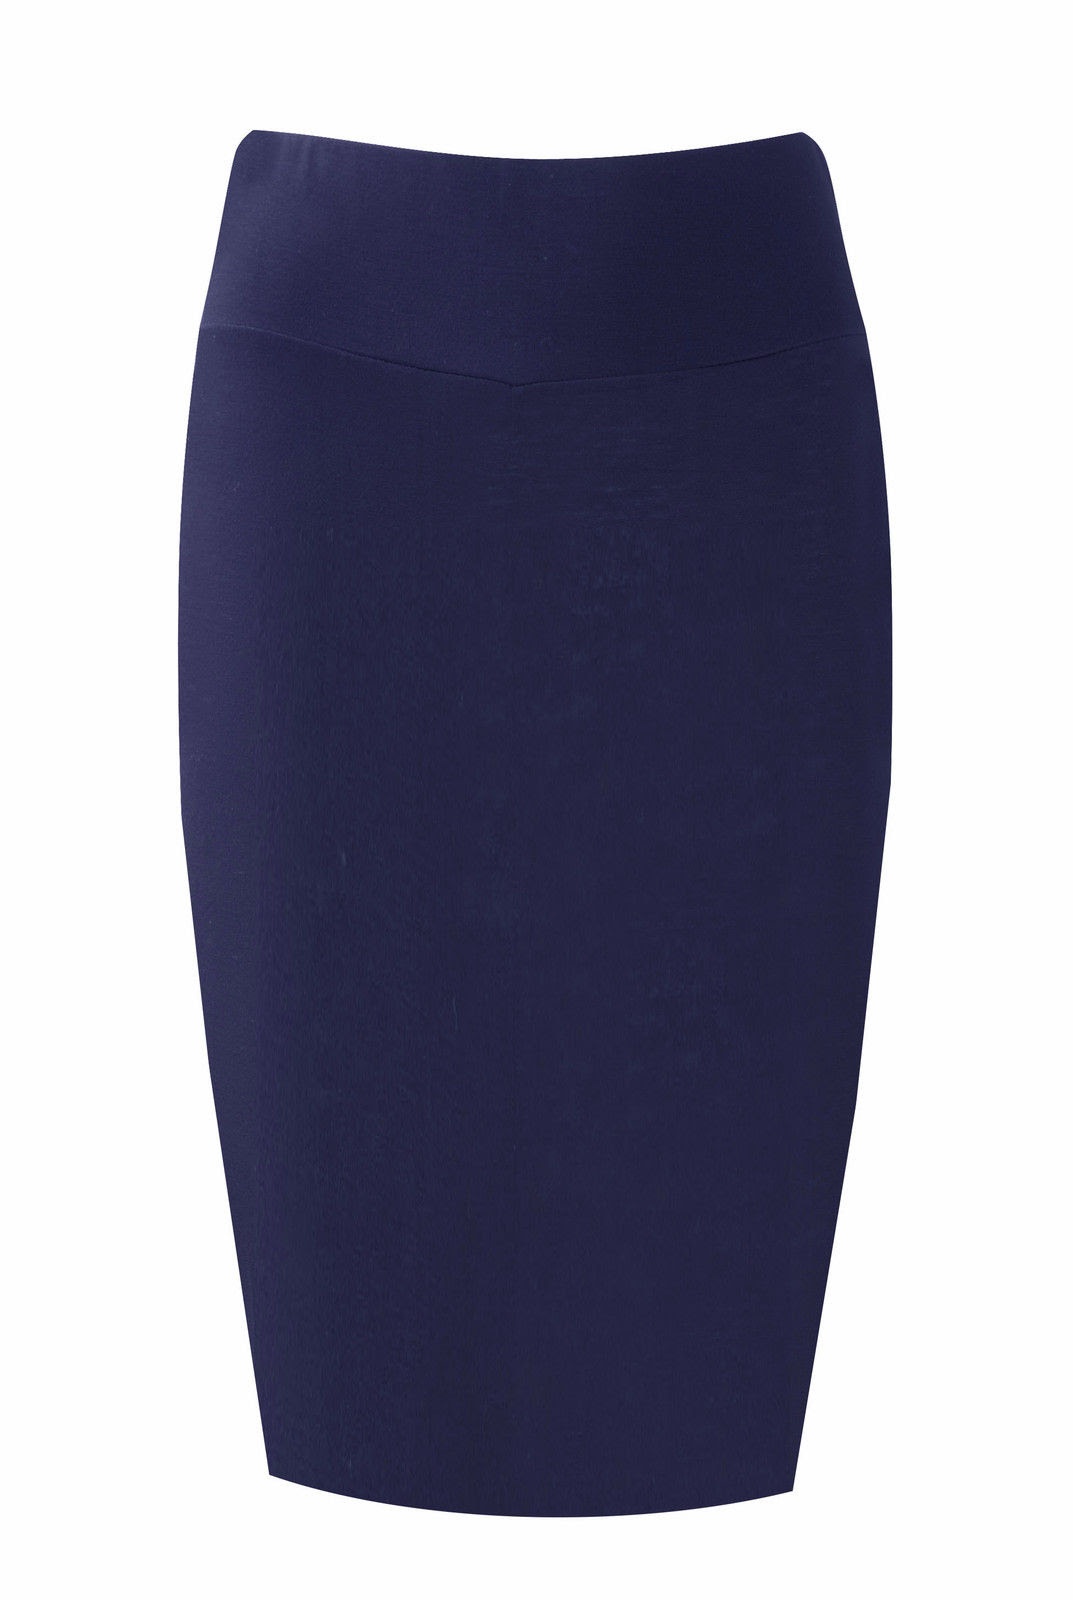 The knee Off Shoulder Plain Bodycon Dresses size canada